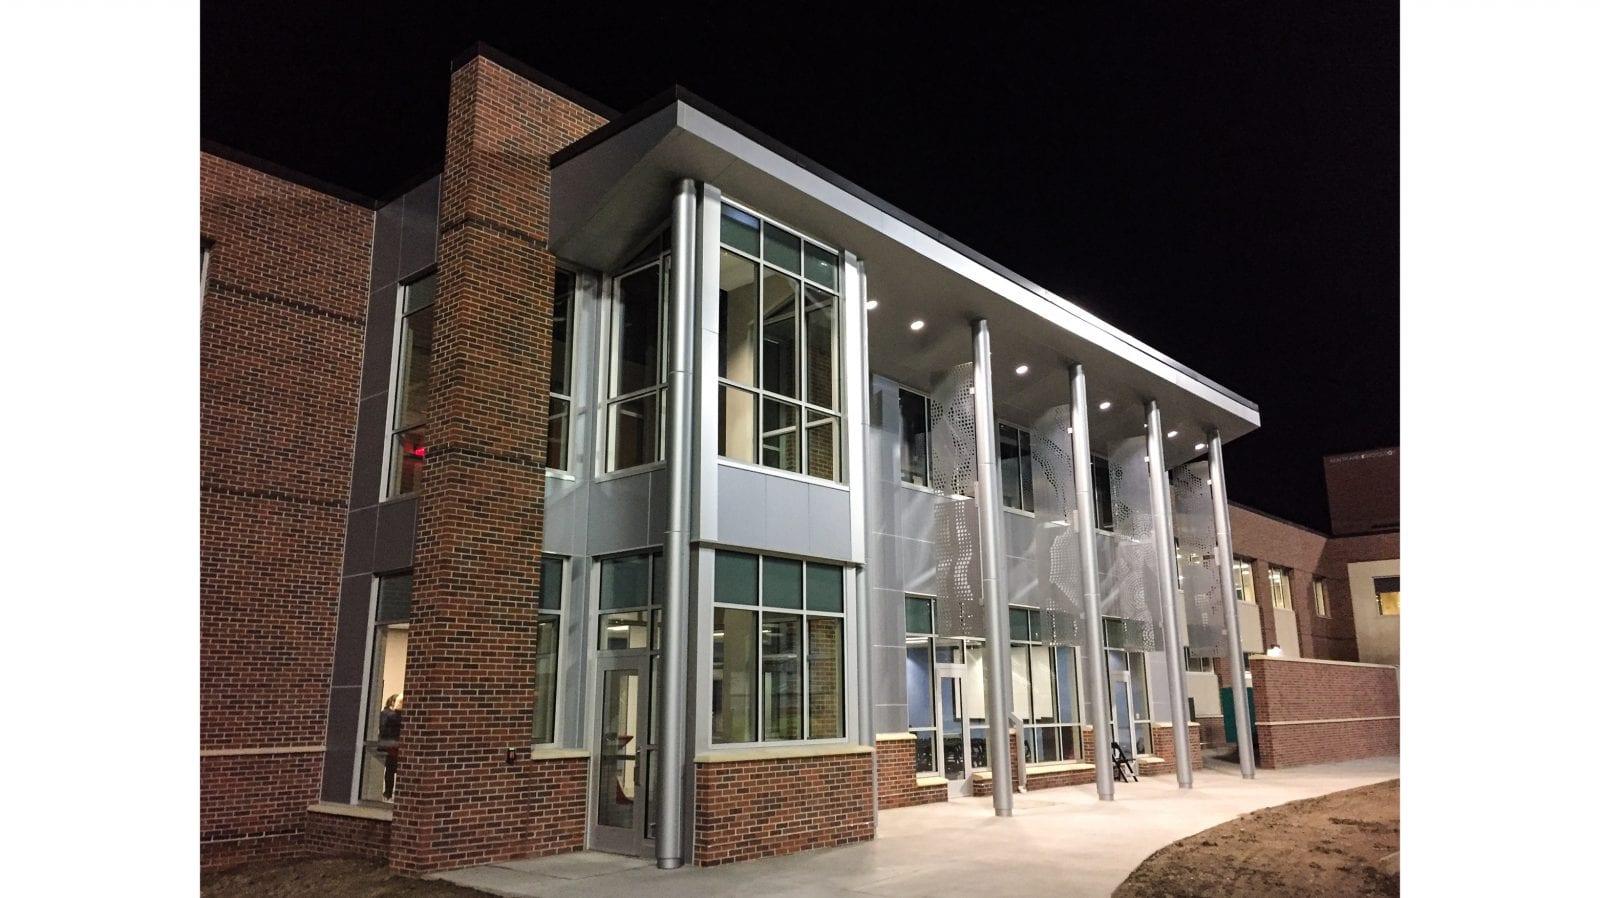 UNO's Biomechanics Research Building